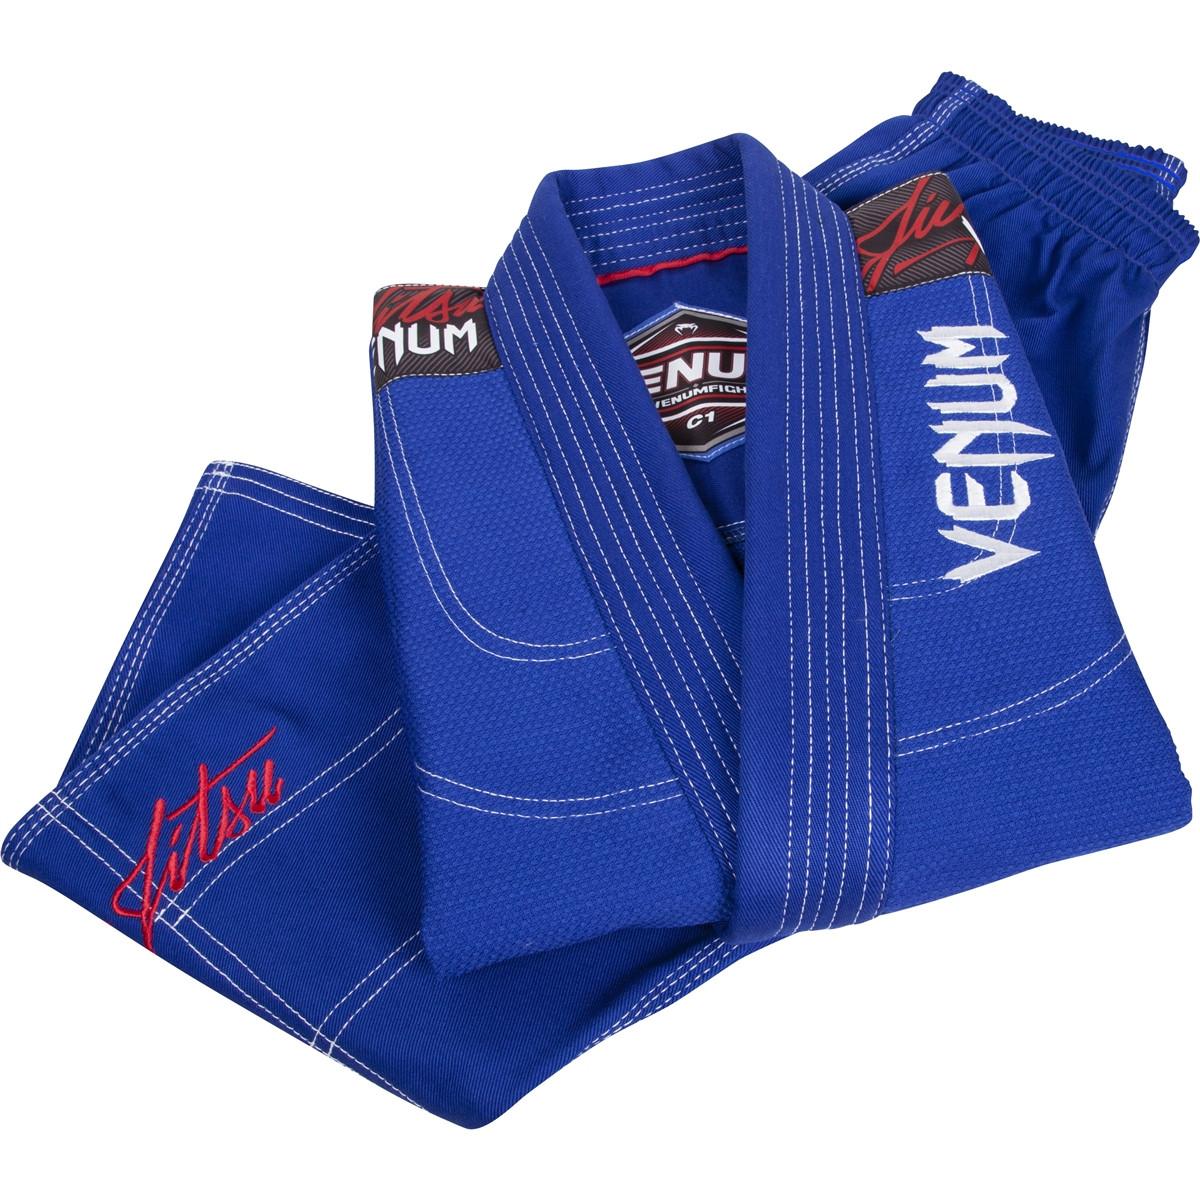 Venum challenger 2.0 kids blue jiu jitsu gi @ www.thejiujitsushop.com